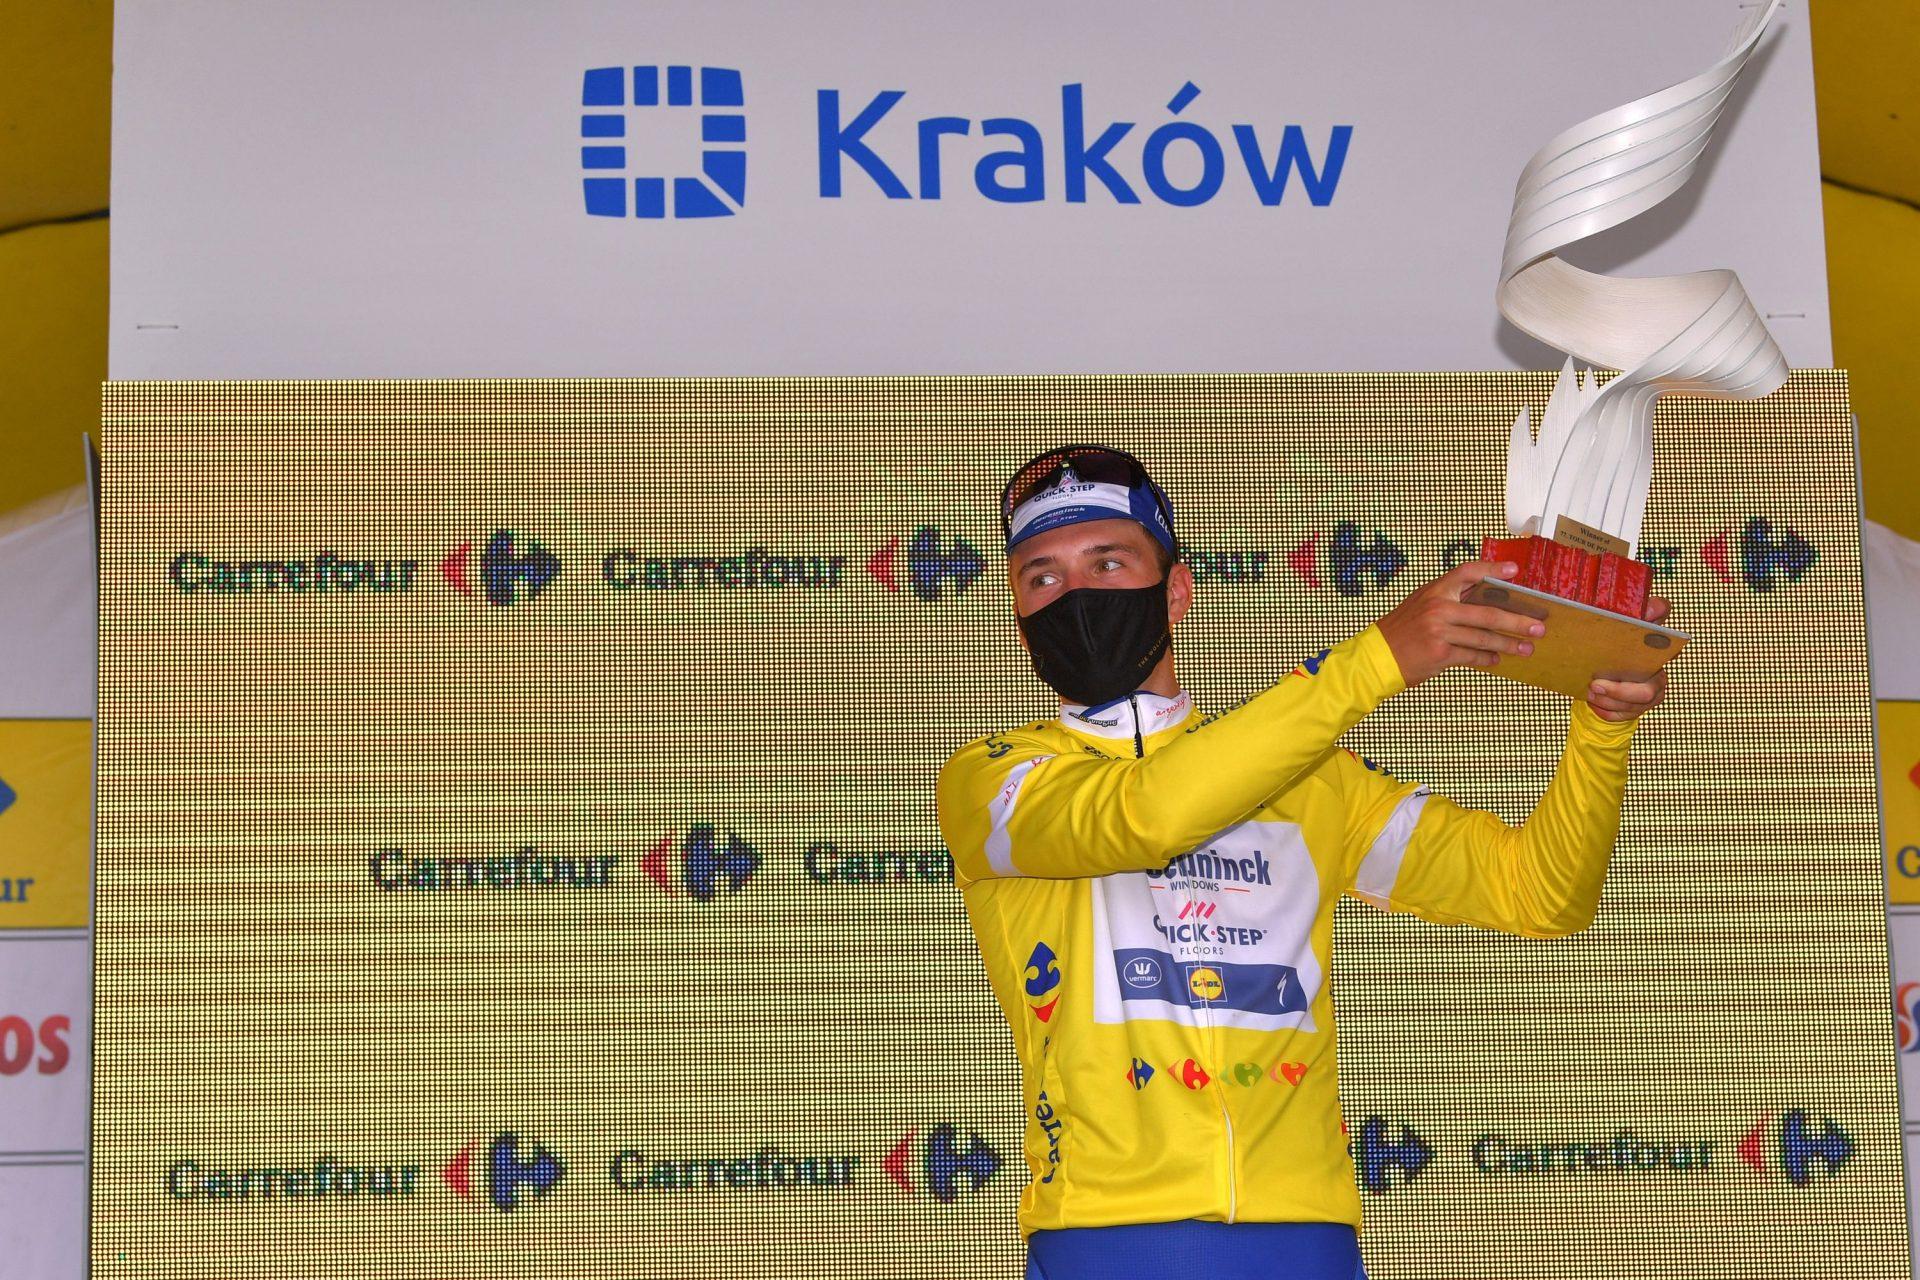 Remco Evenepoel jako šampion etapového závodu Kolem Polska. Foto: Luc-Claessen-Getty-Images/Deceuninck Quick Step